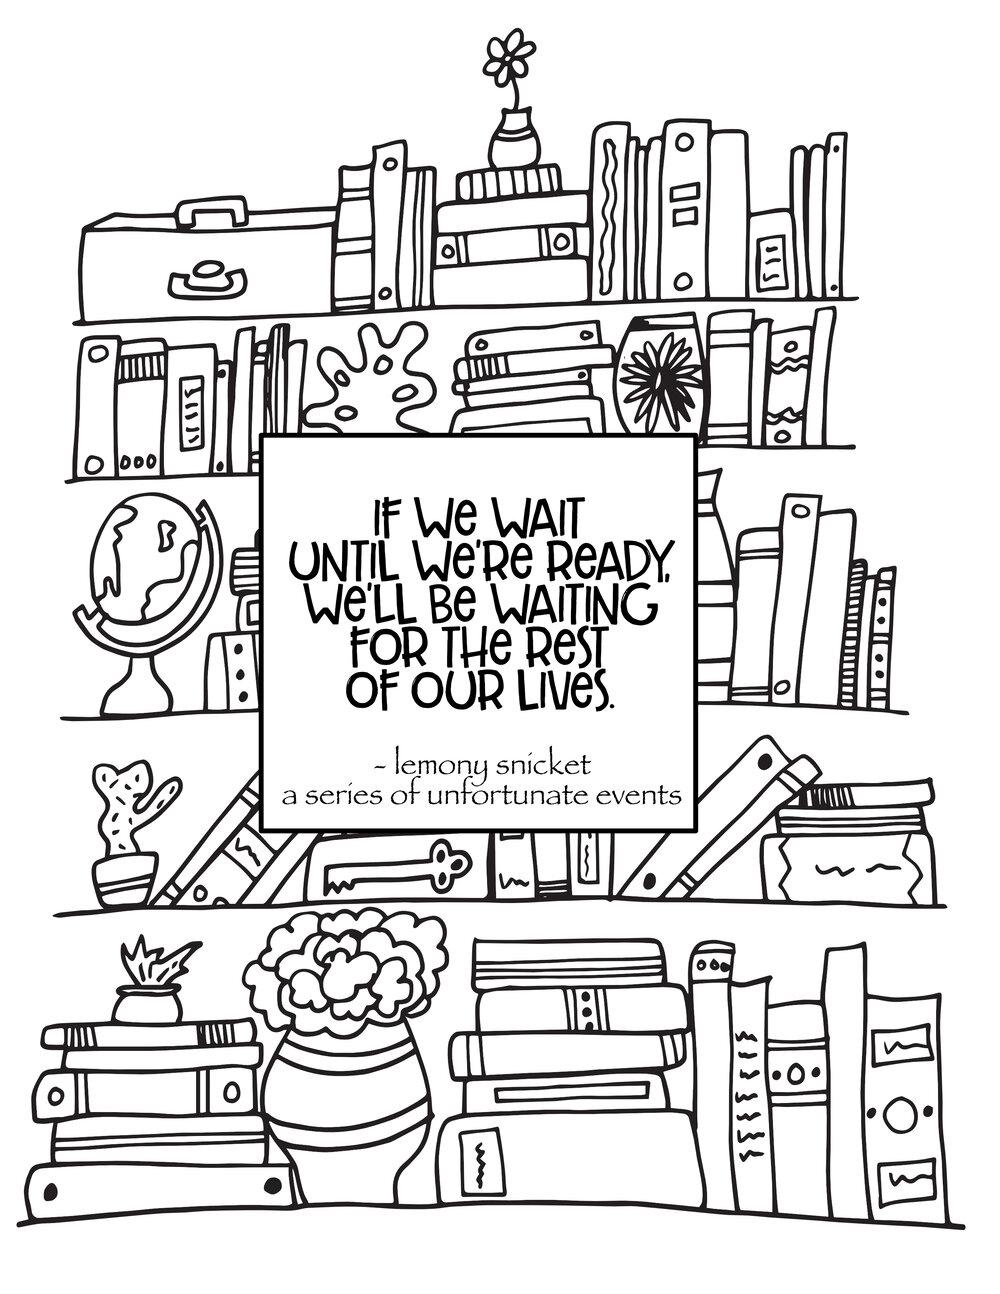 Bookshelf & Lemony Snicket Quote - Free Bookshelf Coloring Page